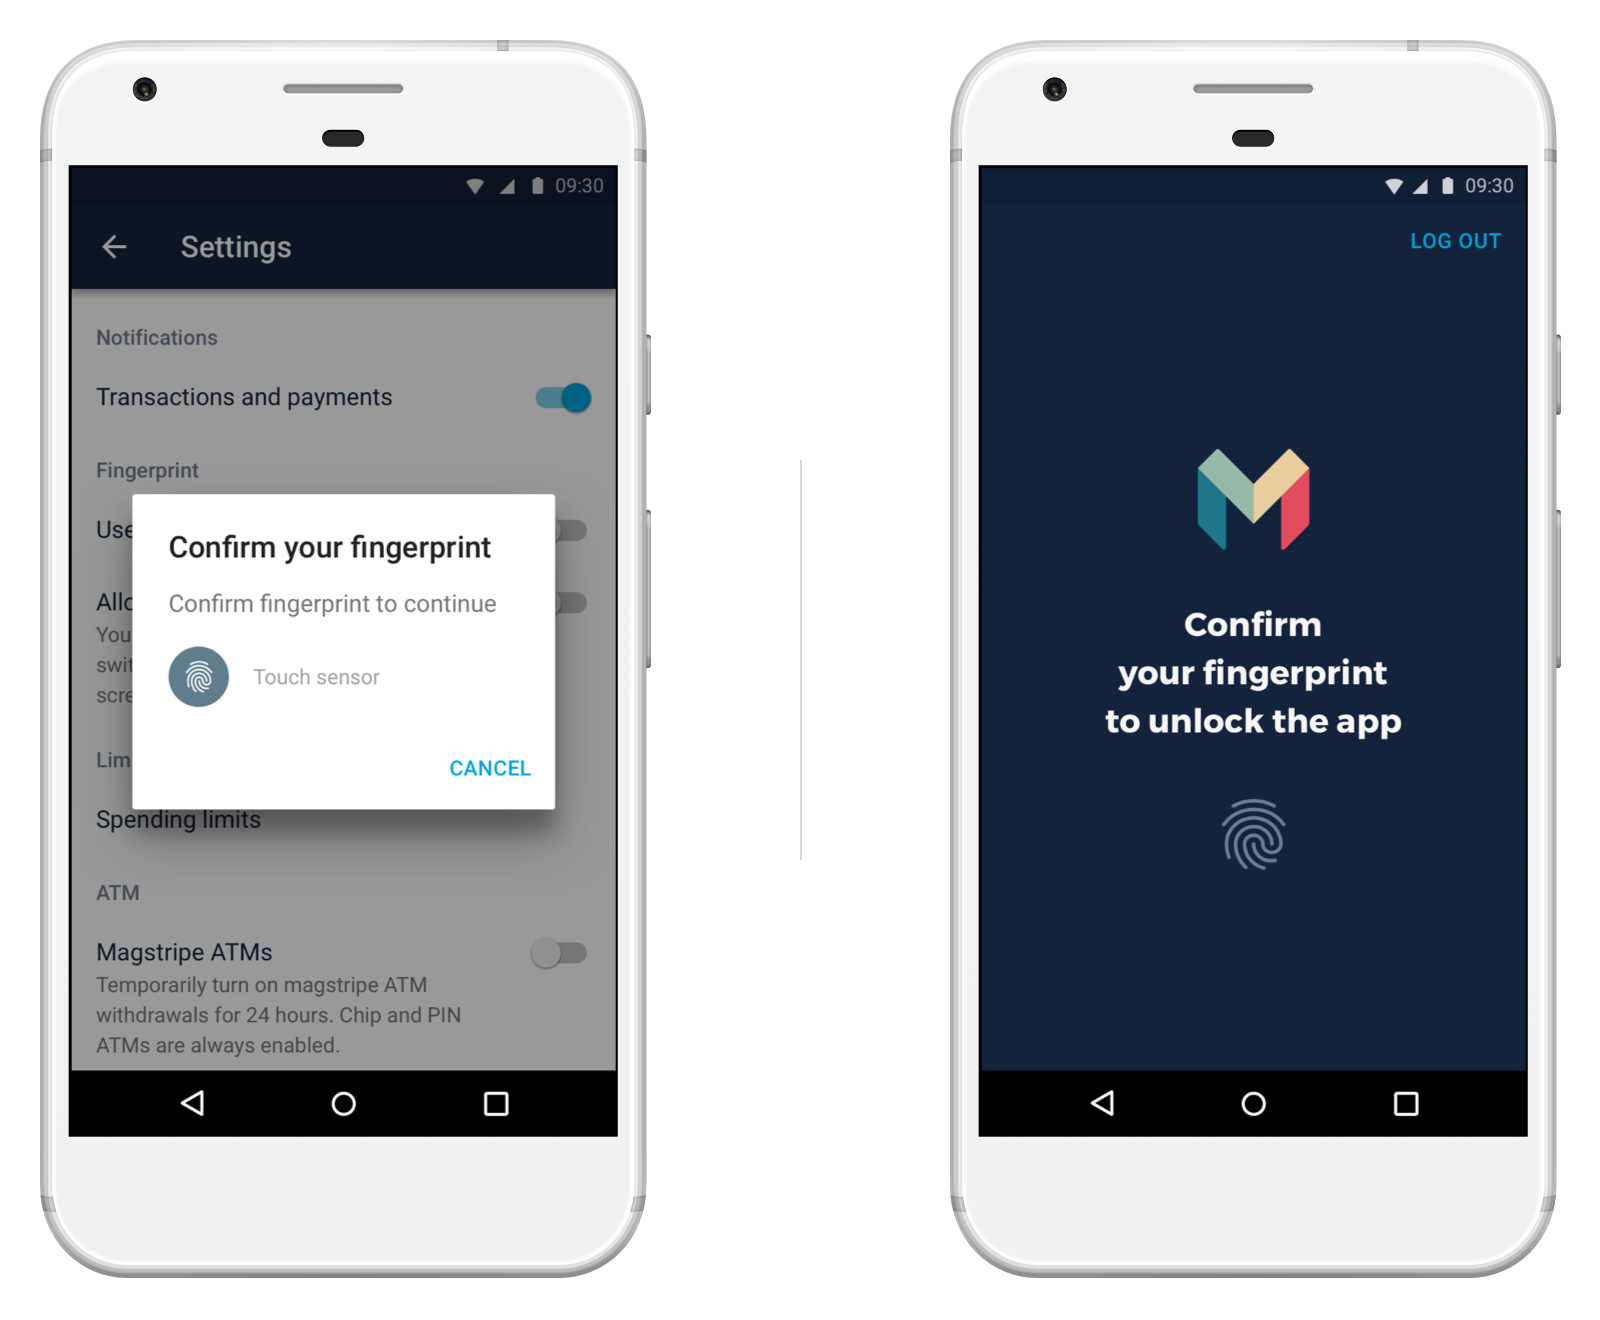 Banking app UX